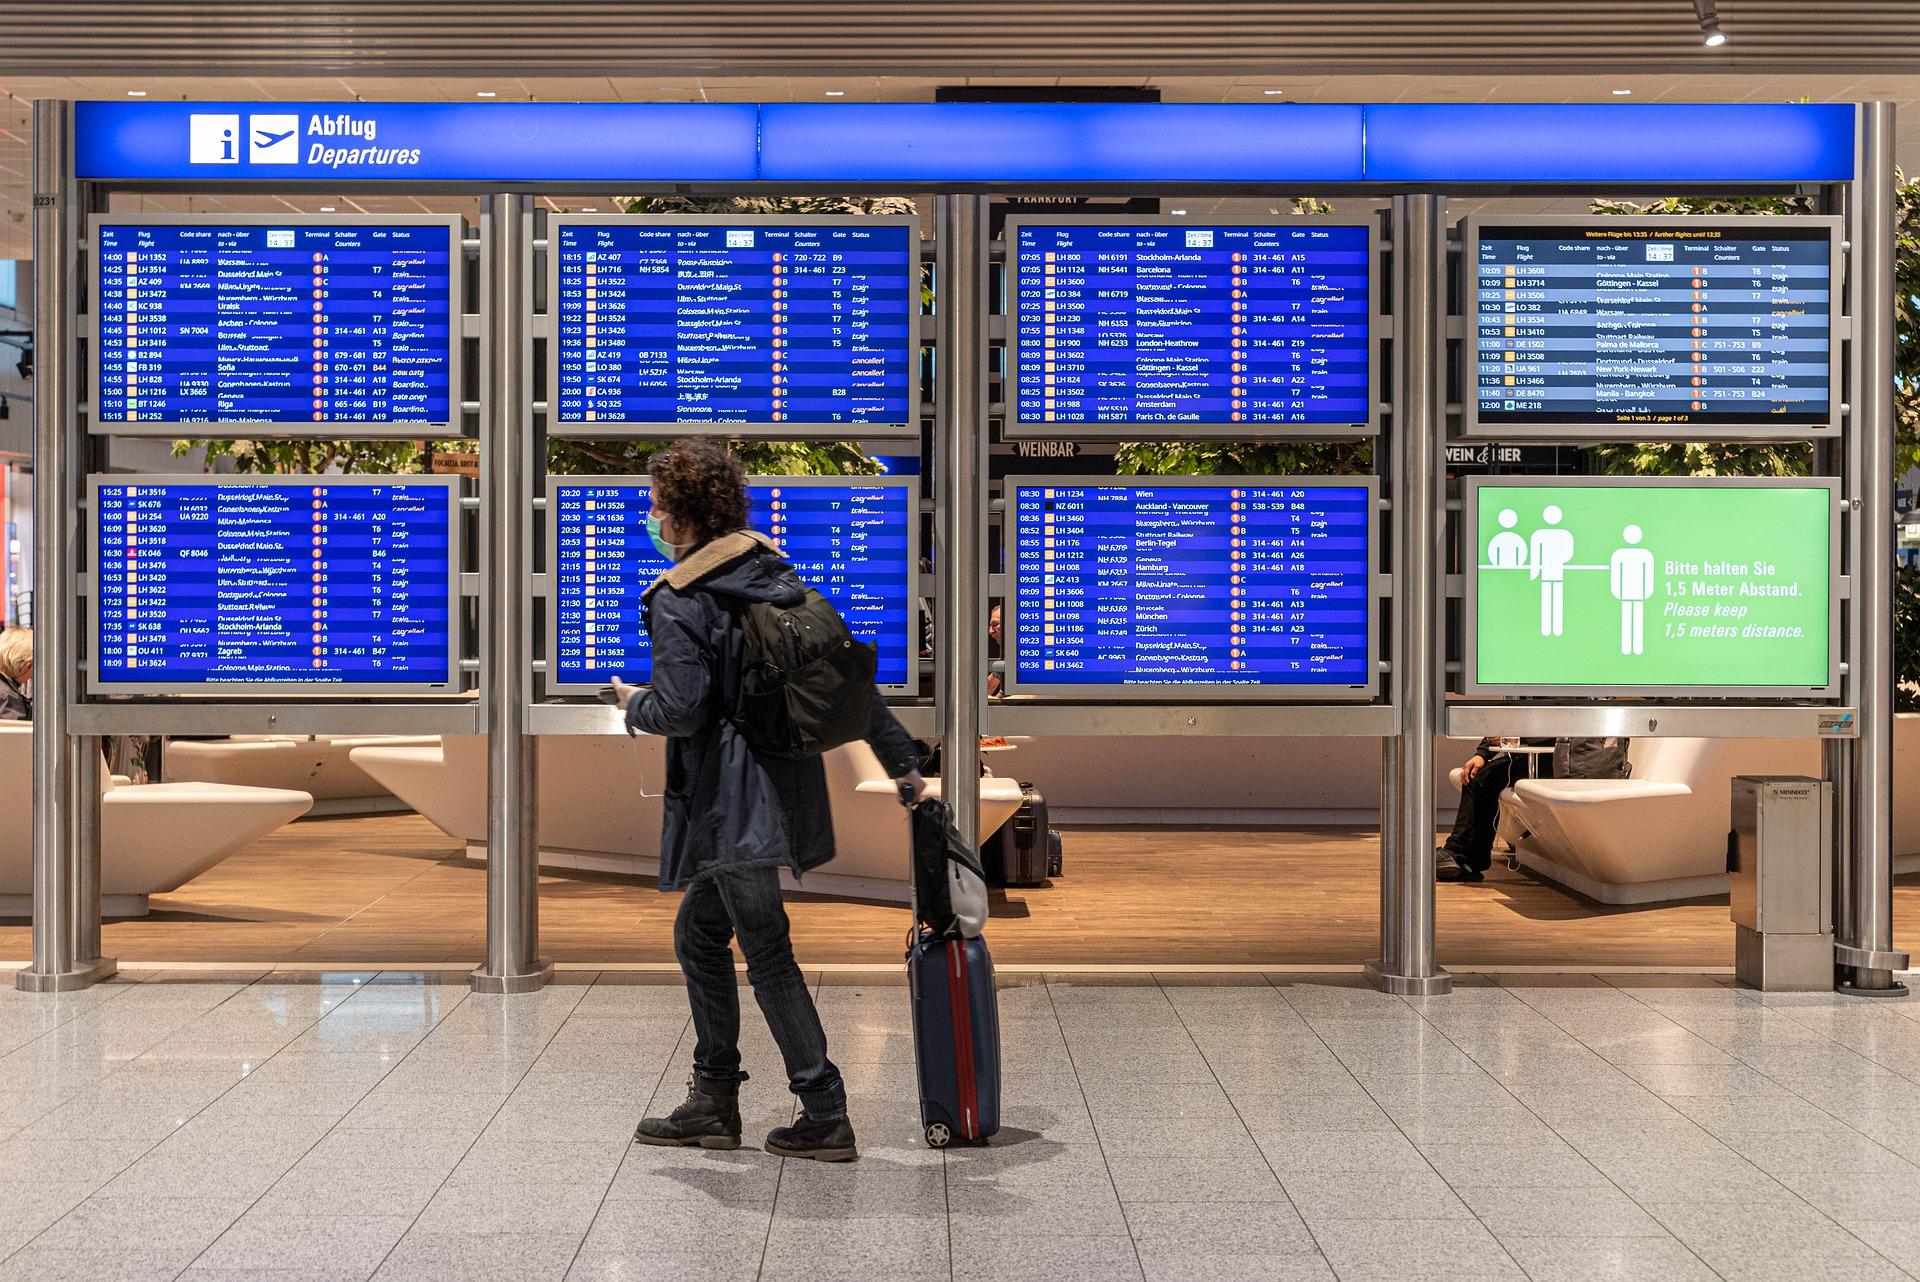 Person walking through an airport